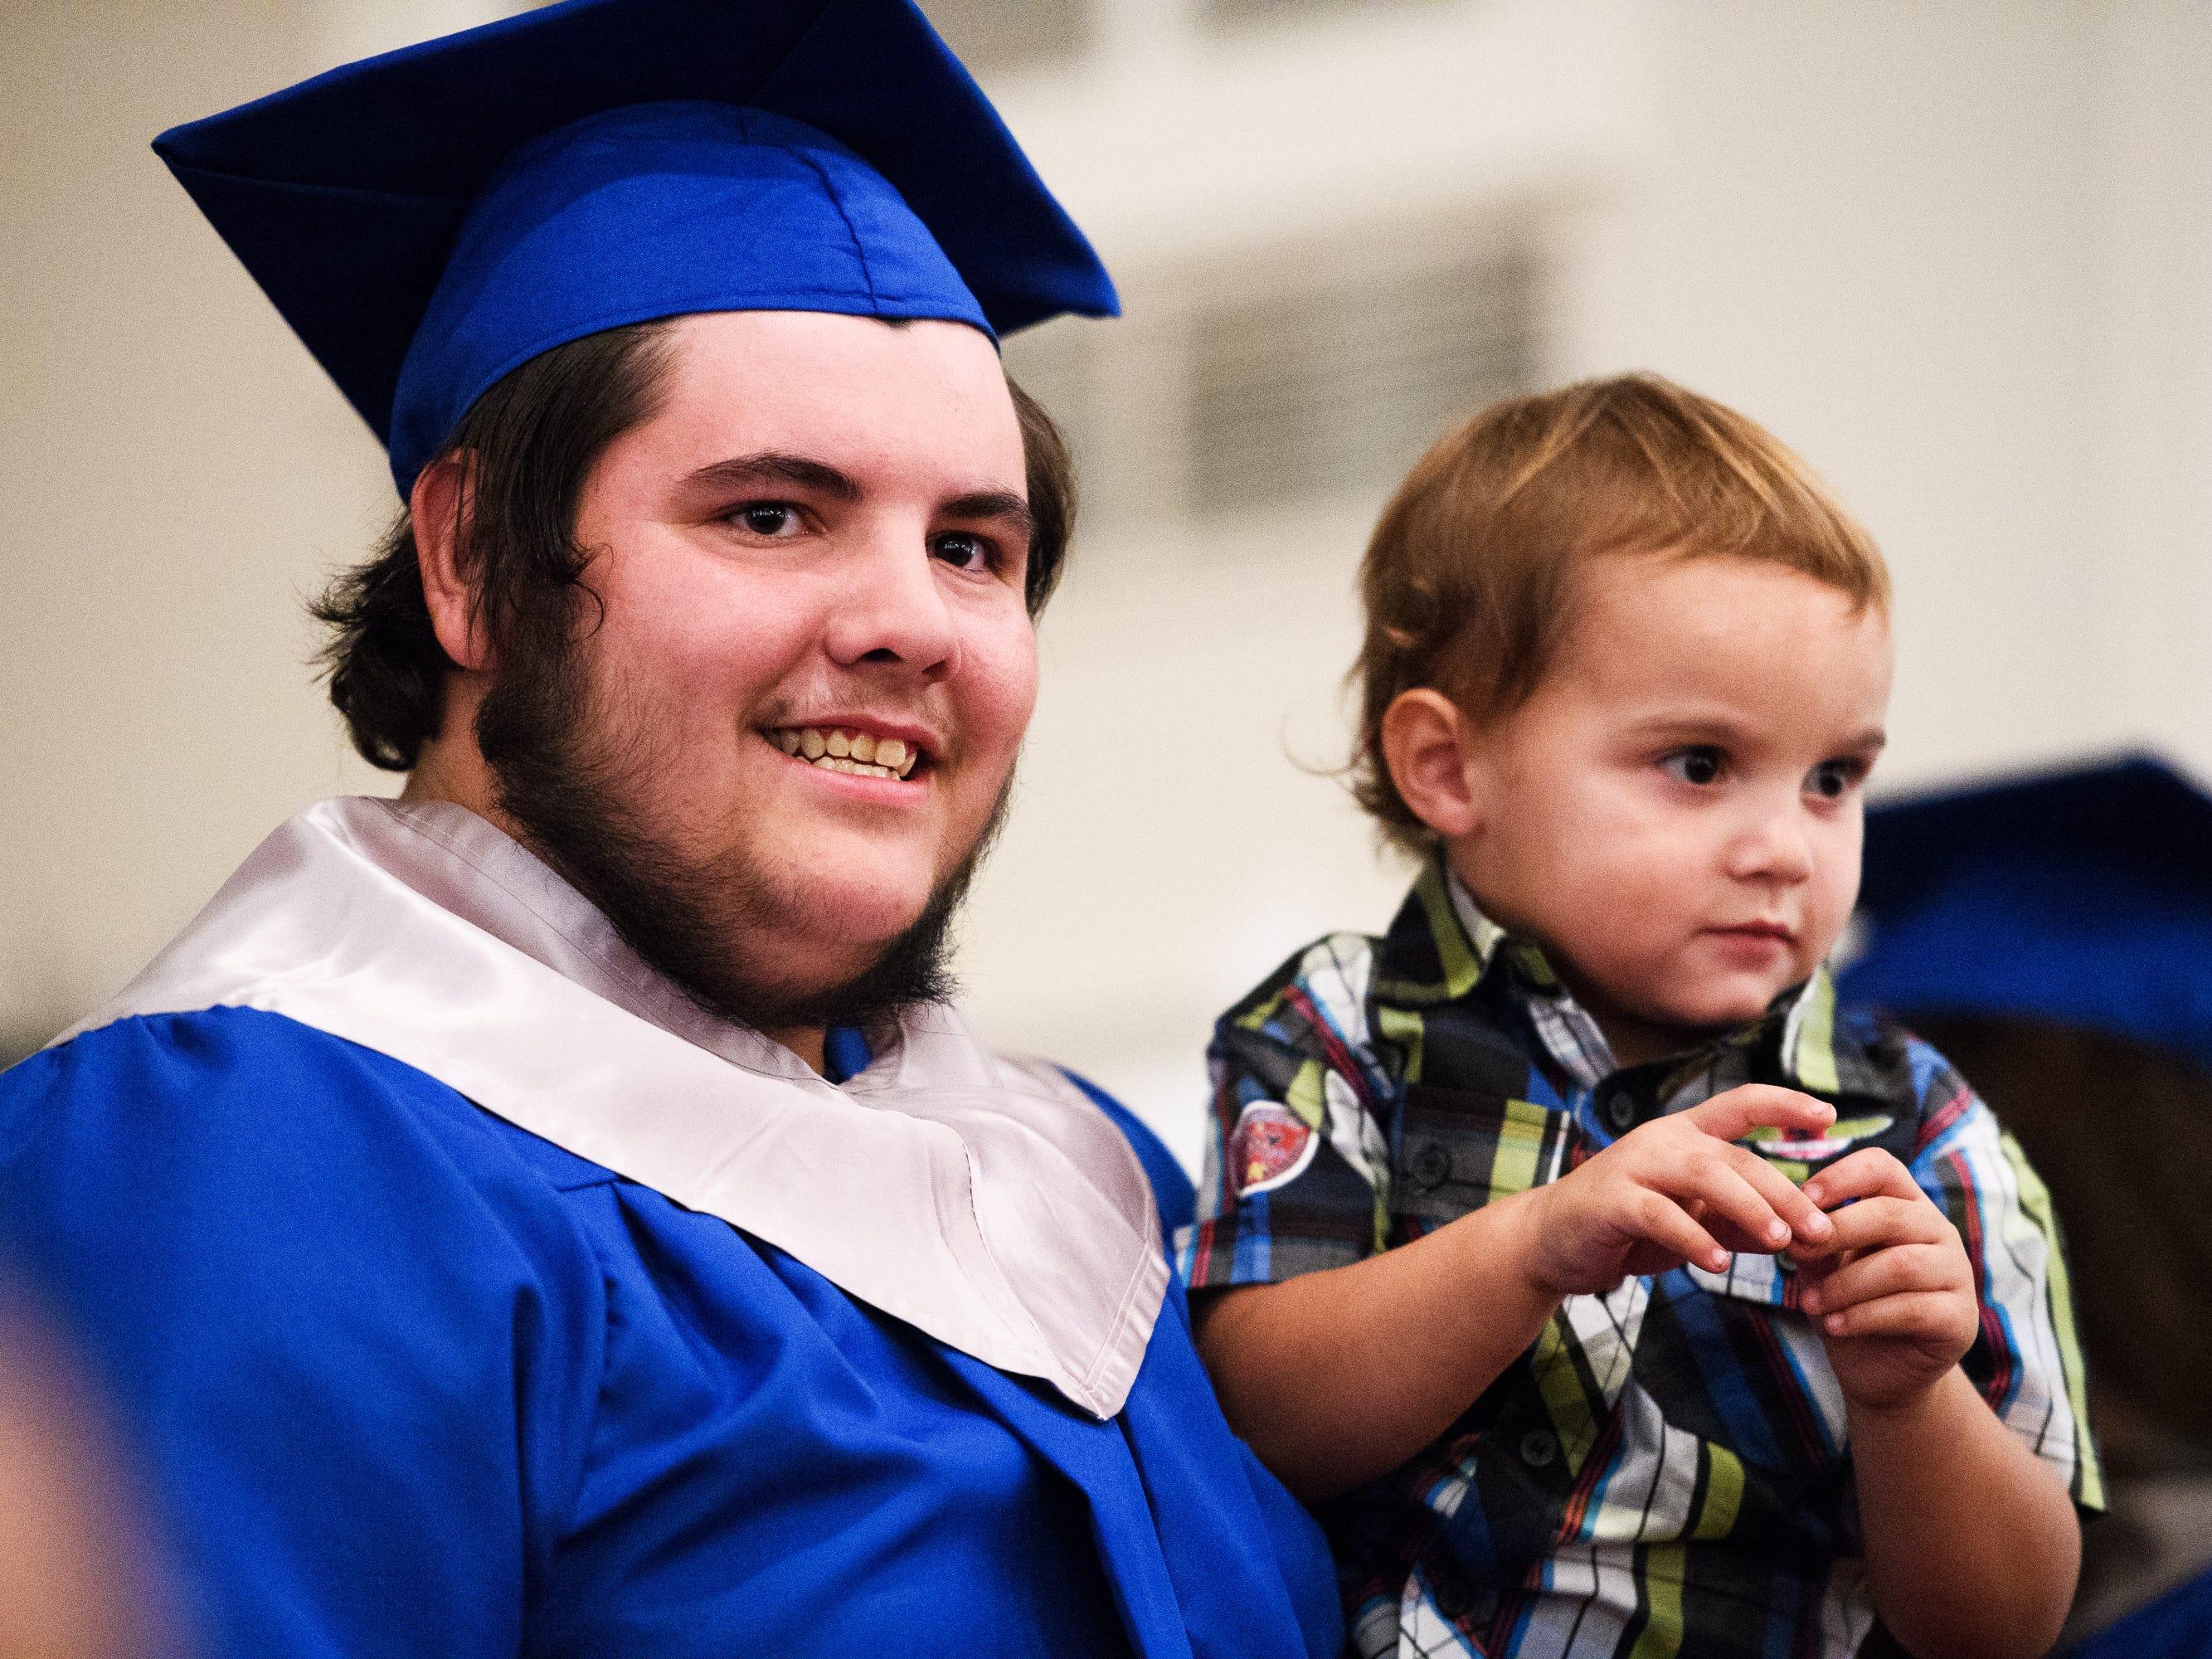 Joshua Lee Vanghn holds his nephew Jace Horne, 2, at Pleasant Grove Baptist Church on Tuesday, Oct. 9, 2018.